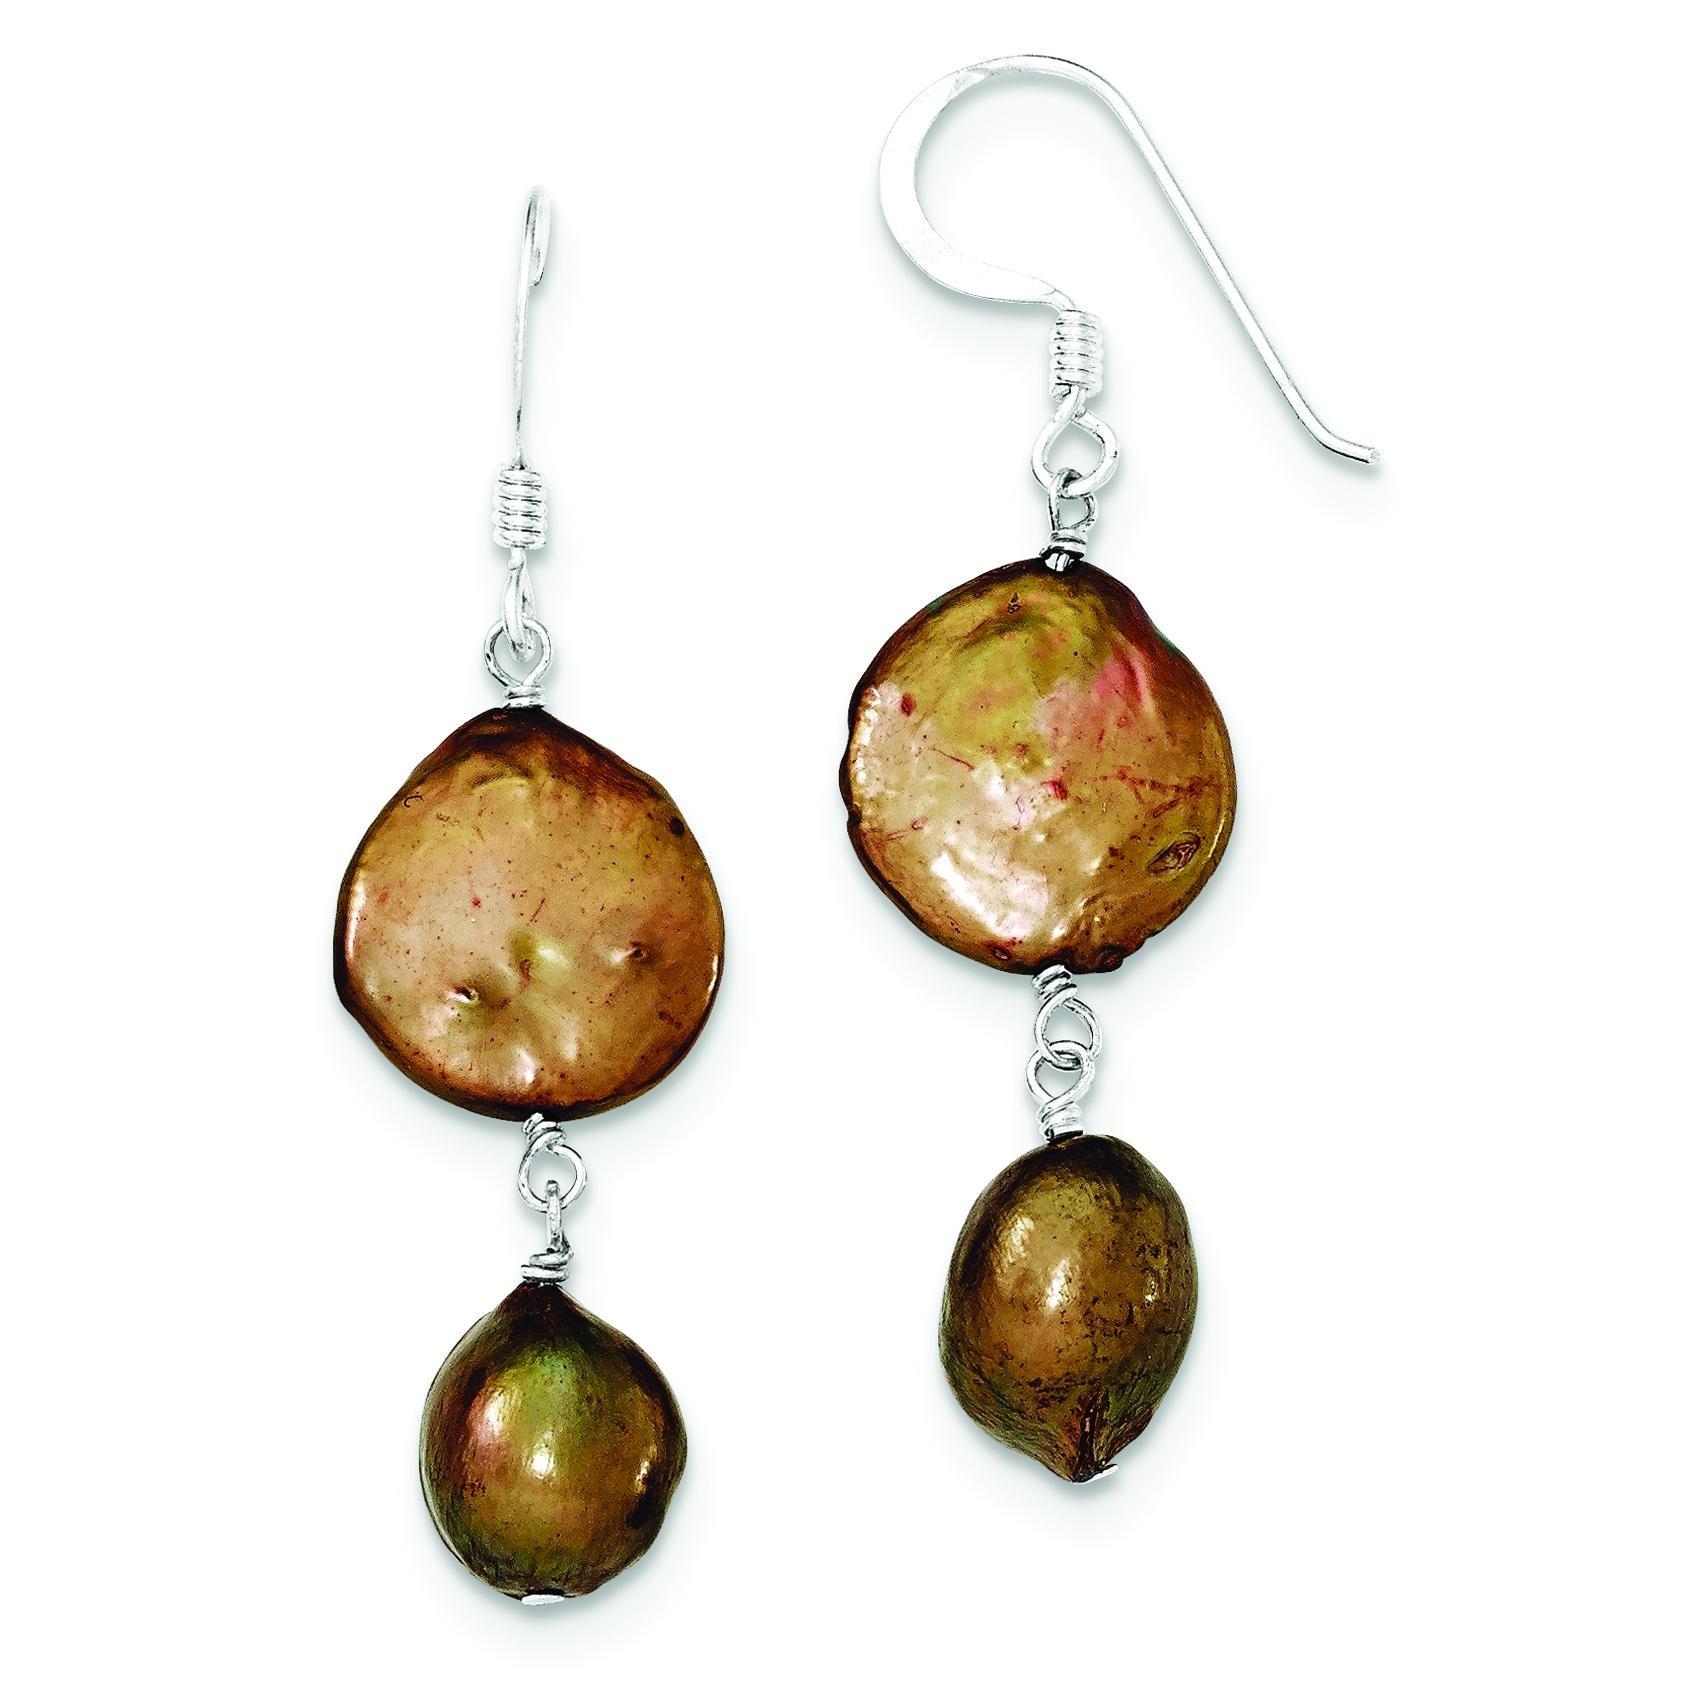 Copper Freshwater Cultured Pearl Earrings in Sterling Silver